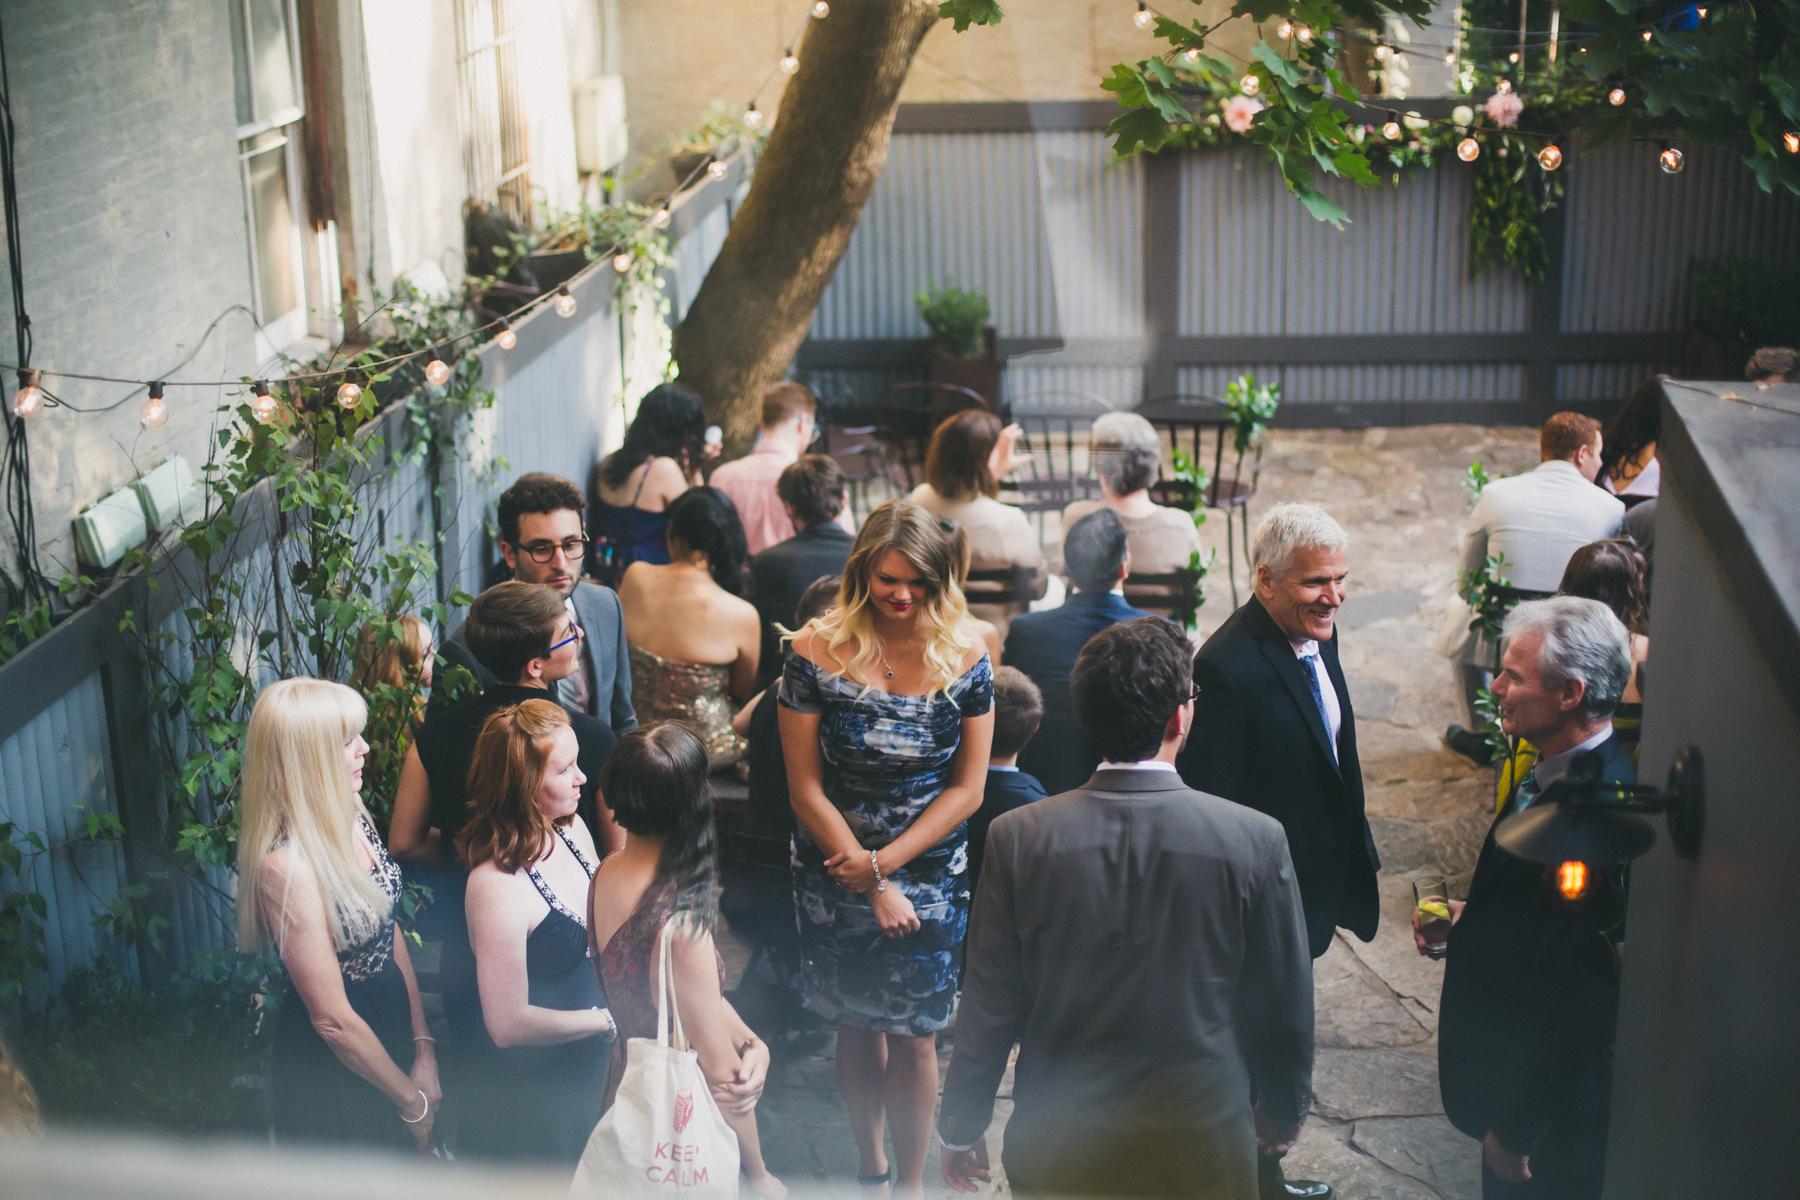 ICI-Restaurant-Fort-Greene-Brooklyn-Intimate-Documentary-Wedding-Photography-Elvira-Kalviste-18.jpg